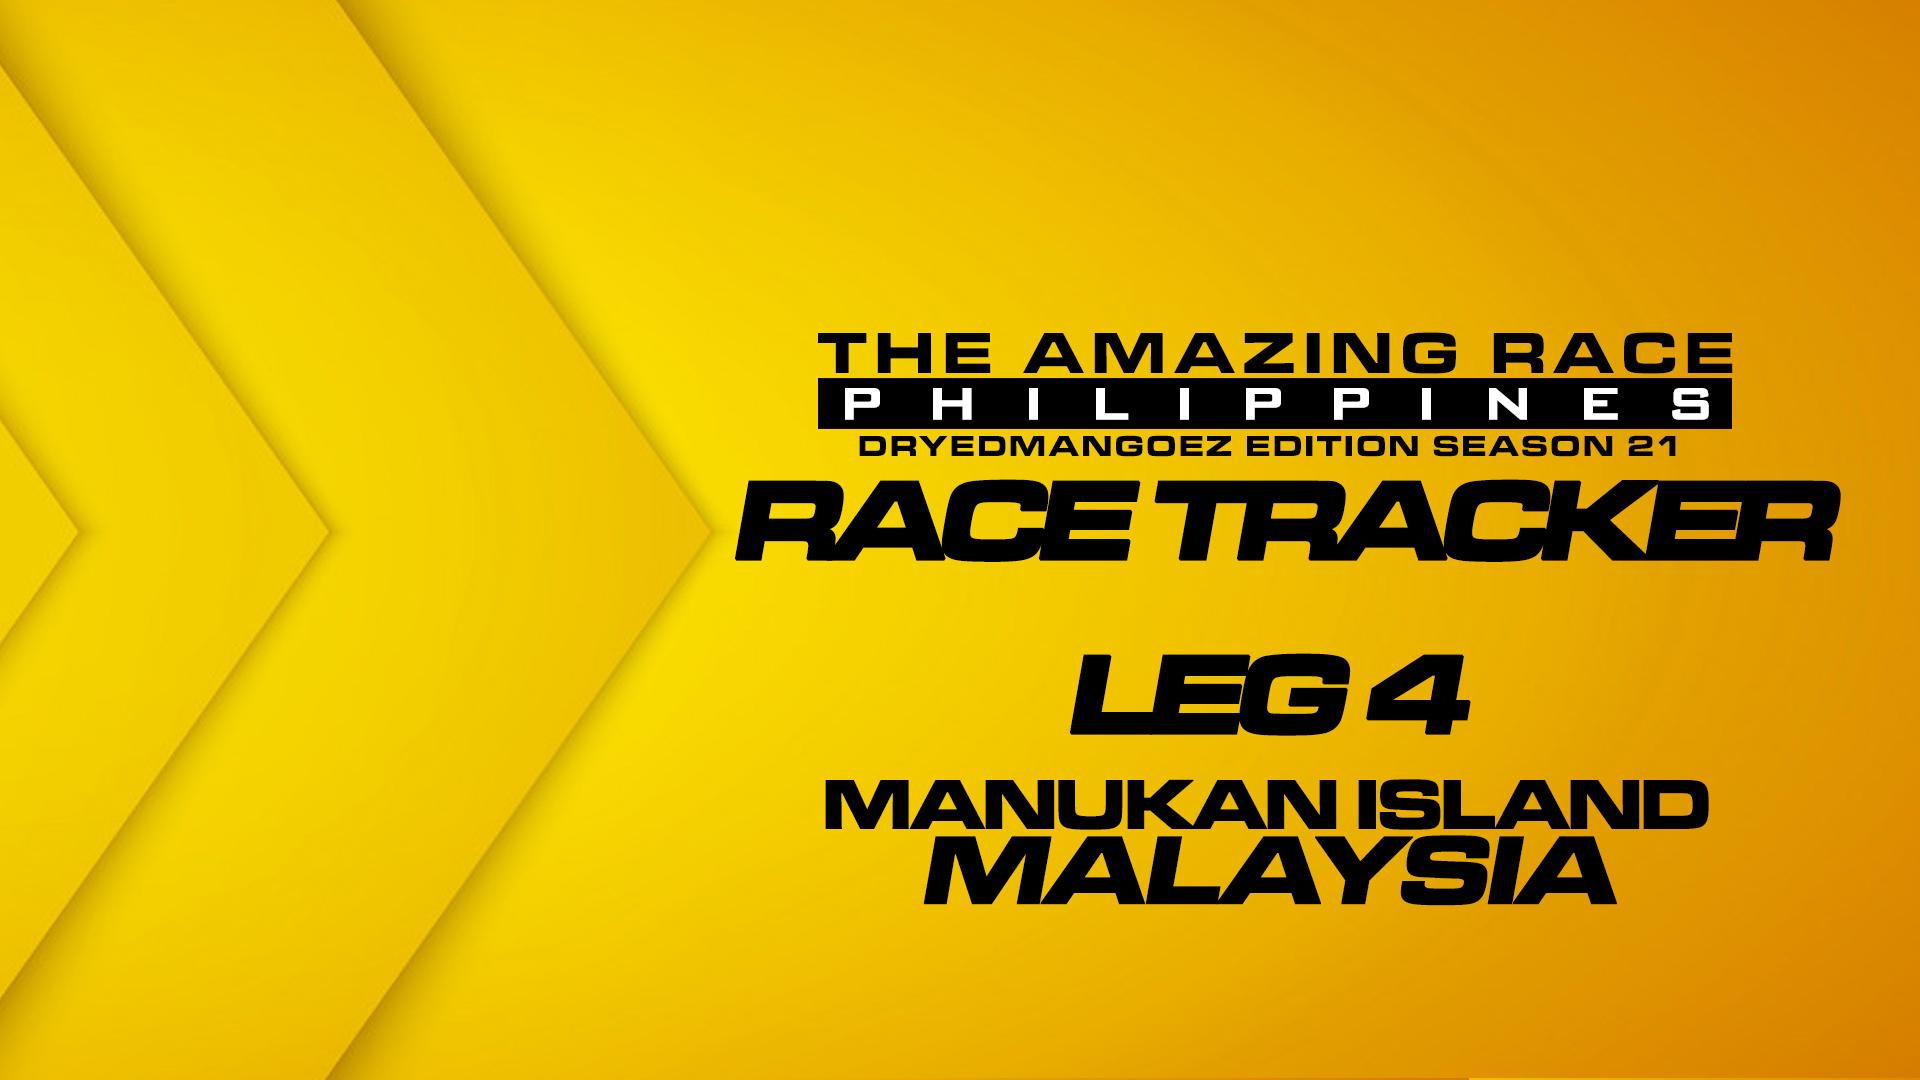 The Amazing Race Philippines: DryedMangoez Edition Season 21 Race Tracker – Leg 4